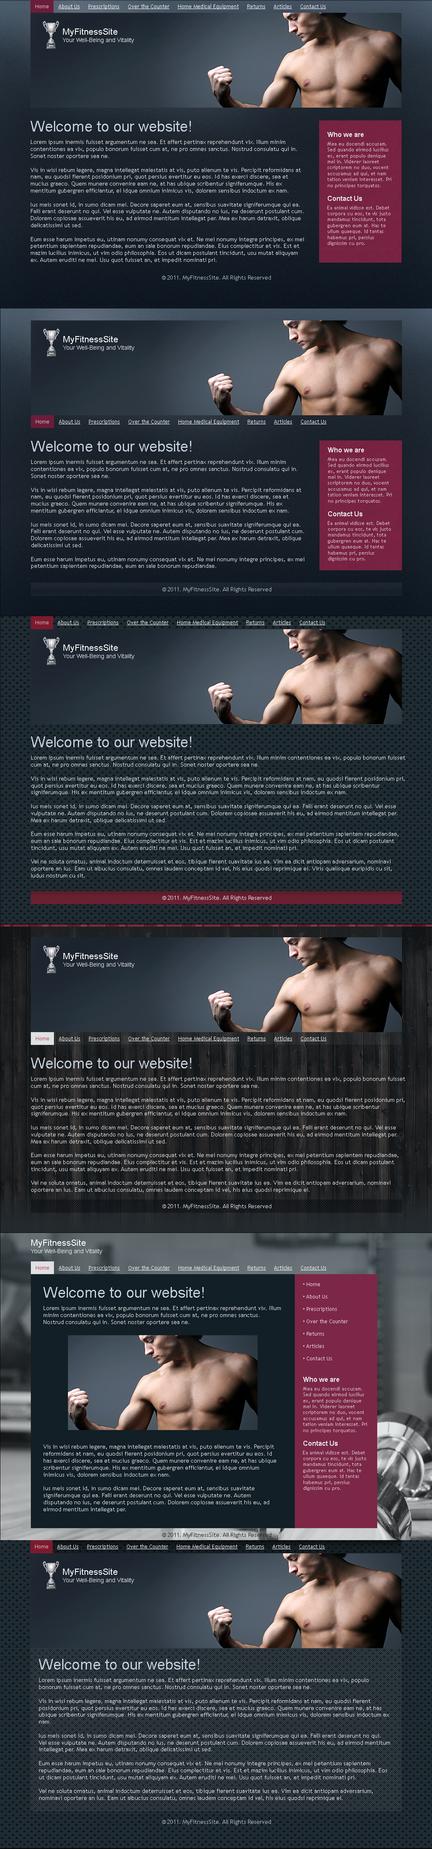 Fitness template by blackblurrr